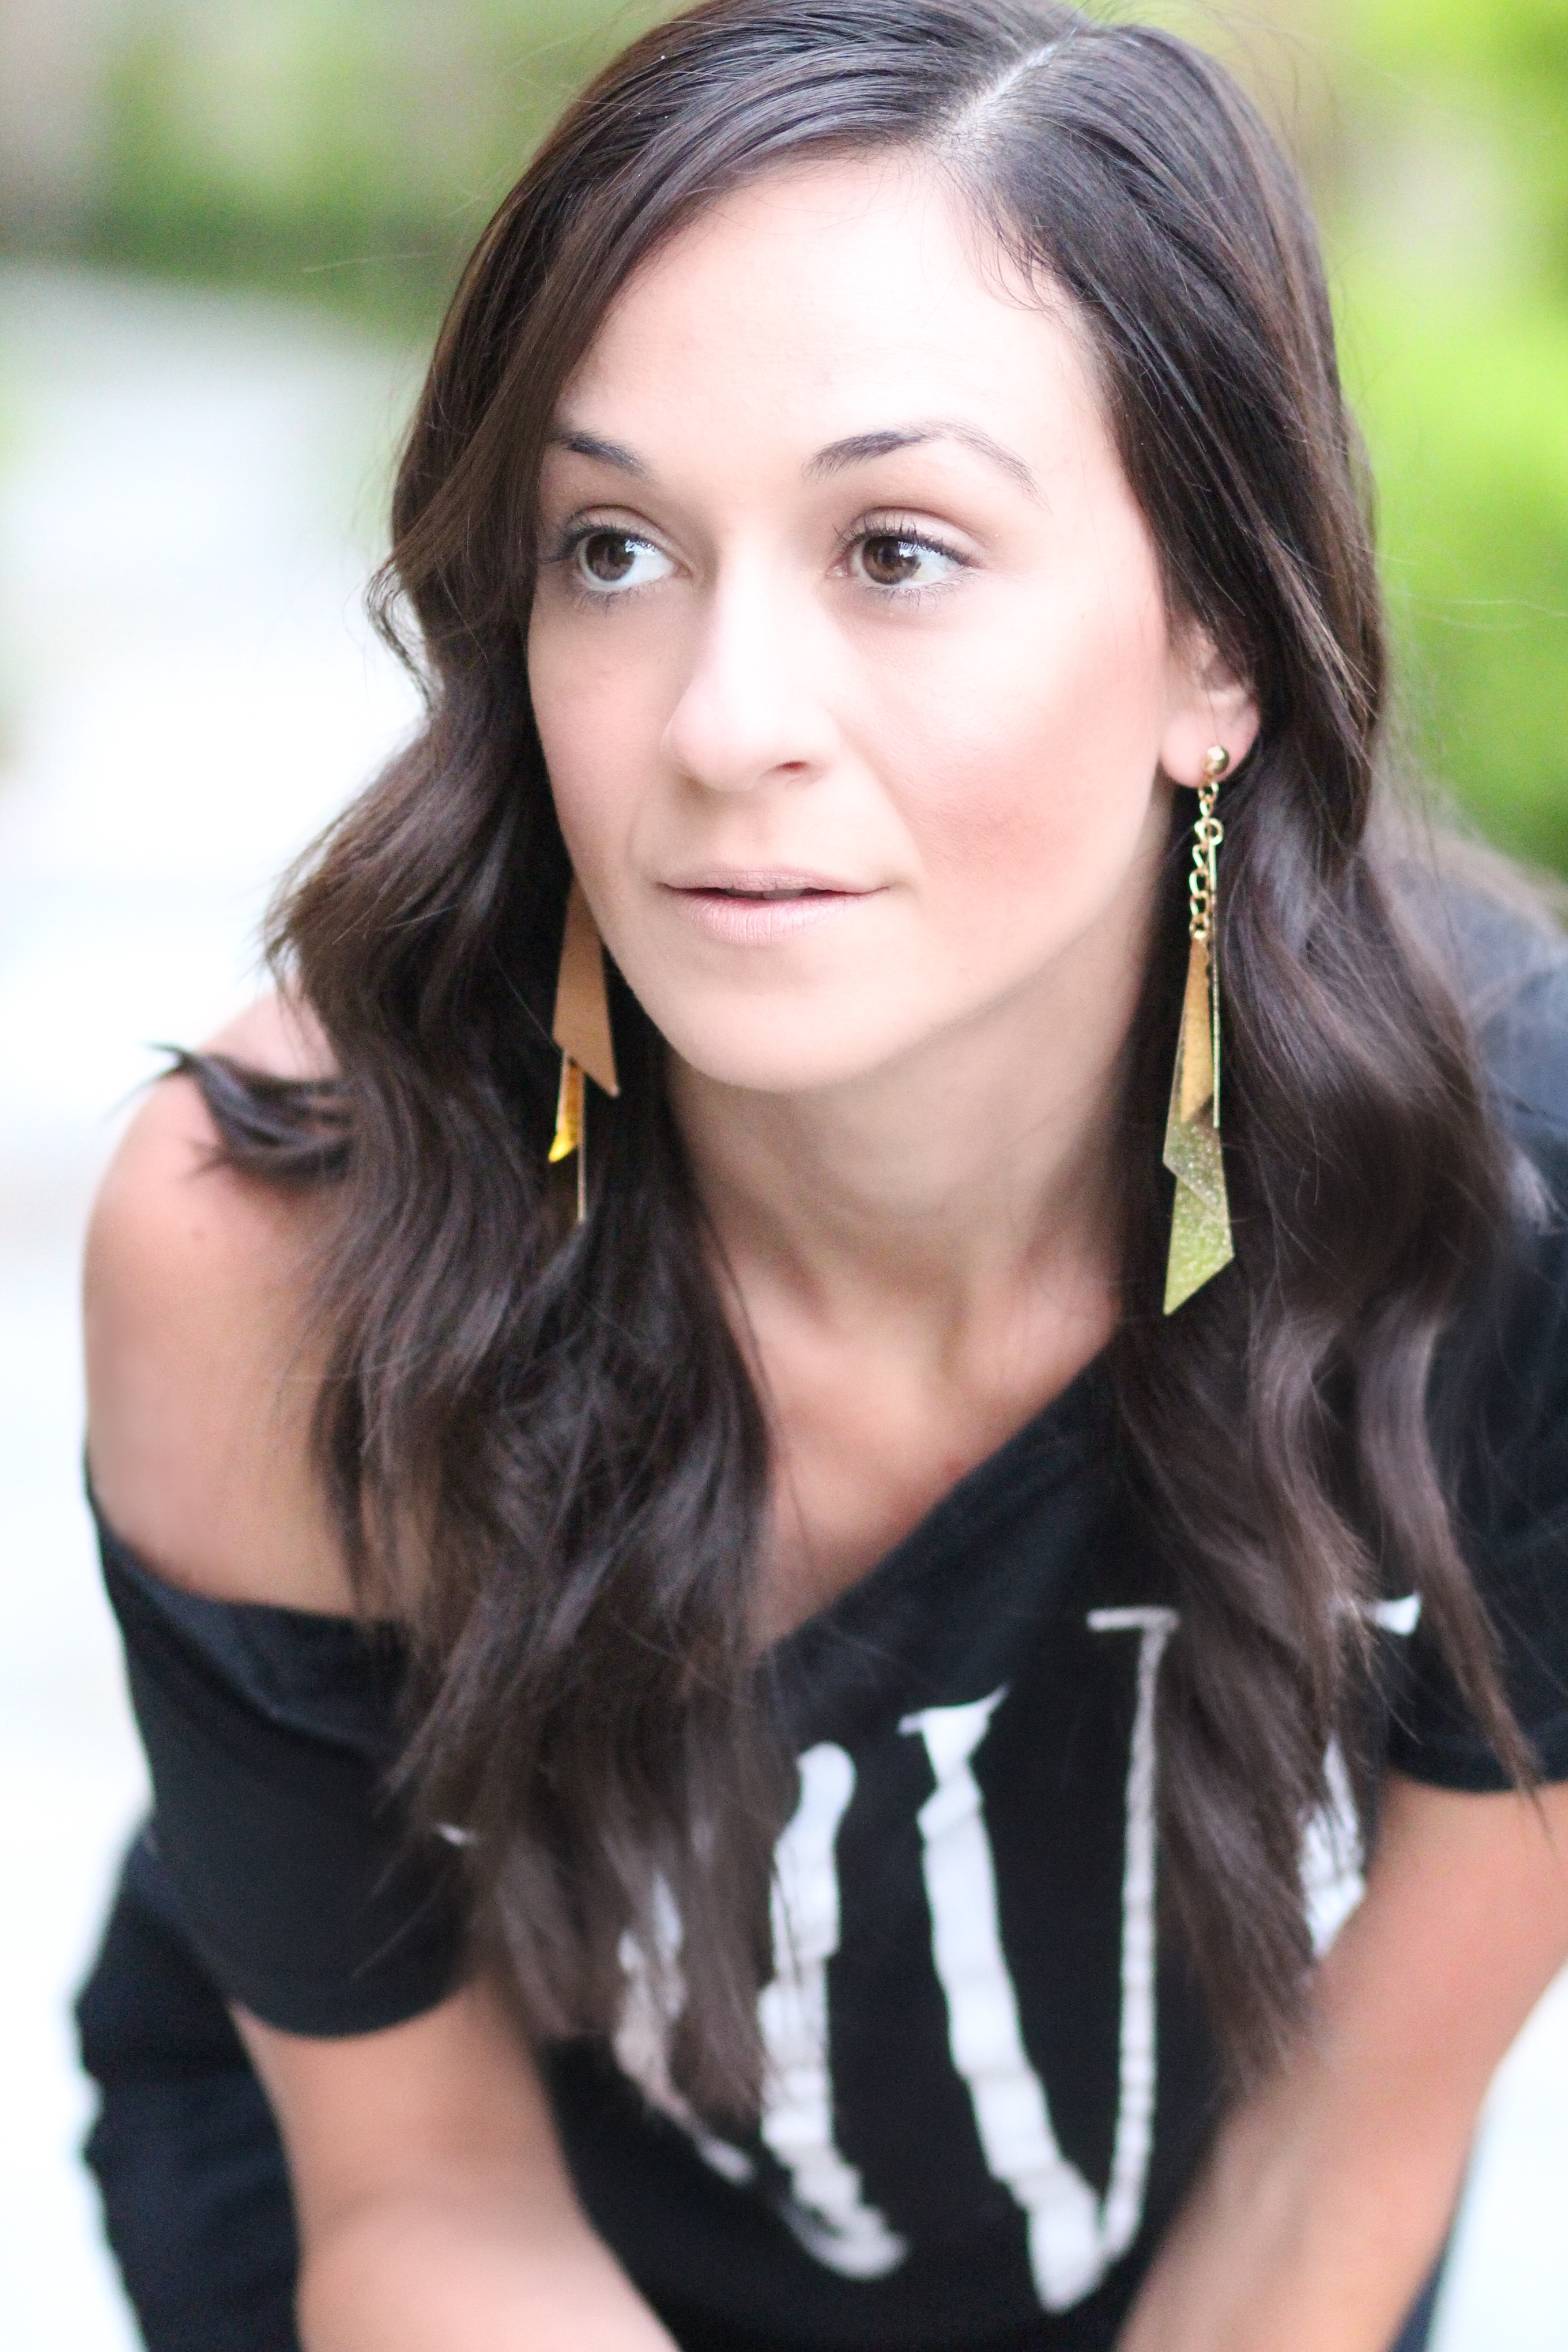 Fashion blogger, Marianne Harper